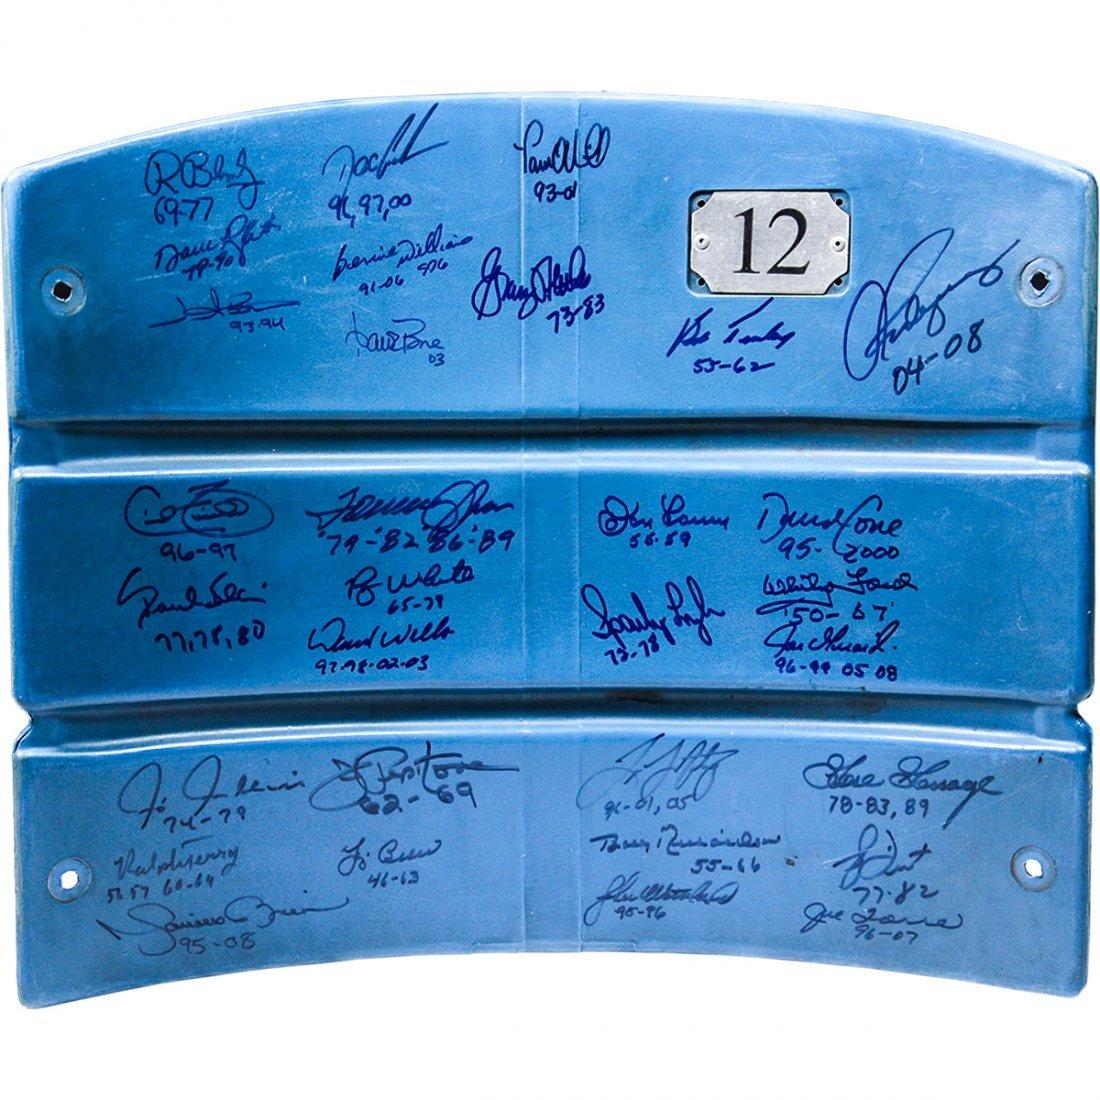 Multi-Signed Authentic Seatback from The Original Yanke